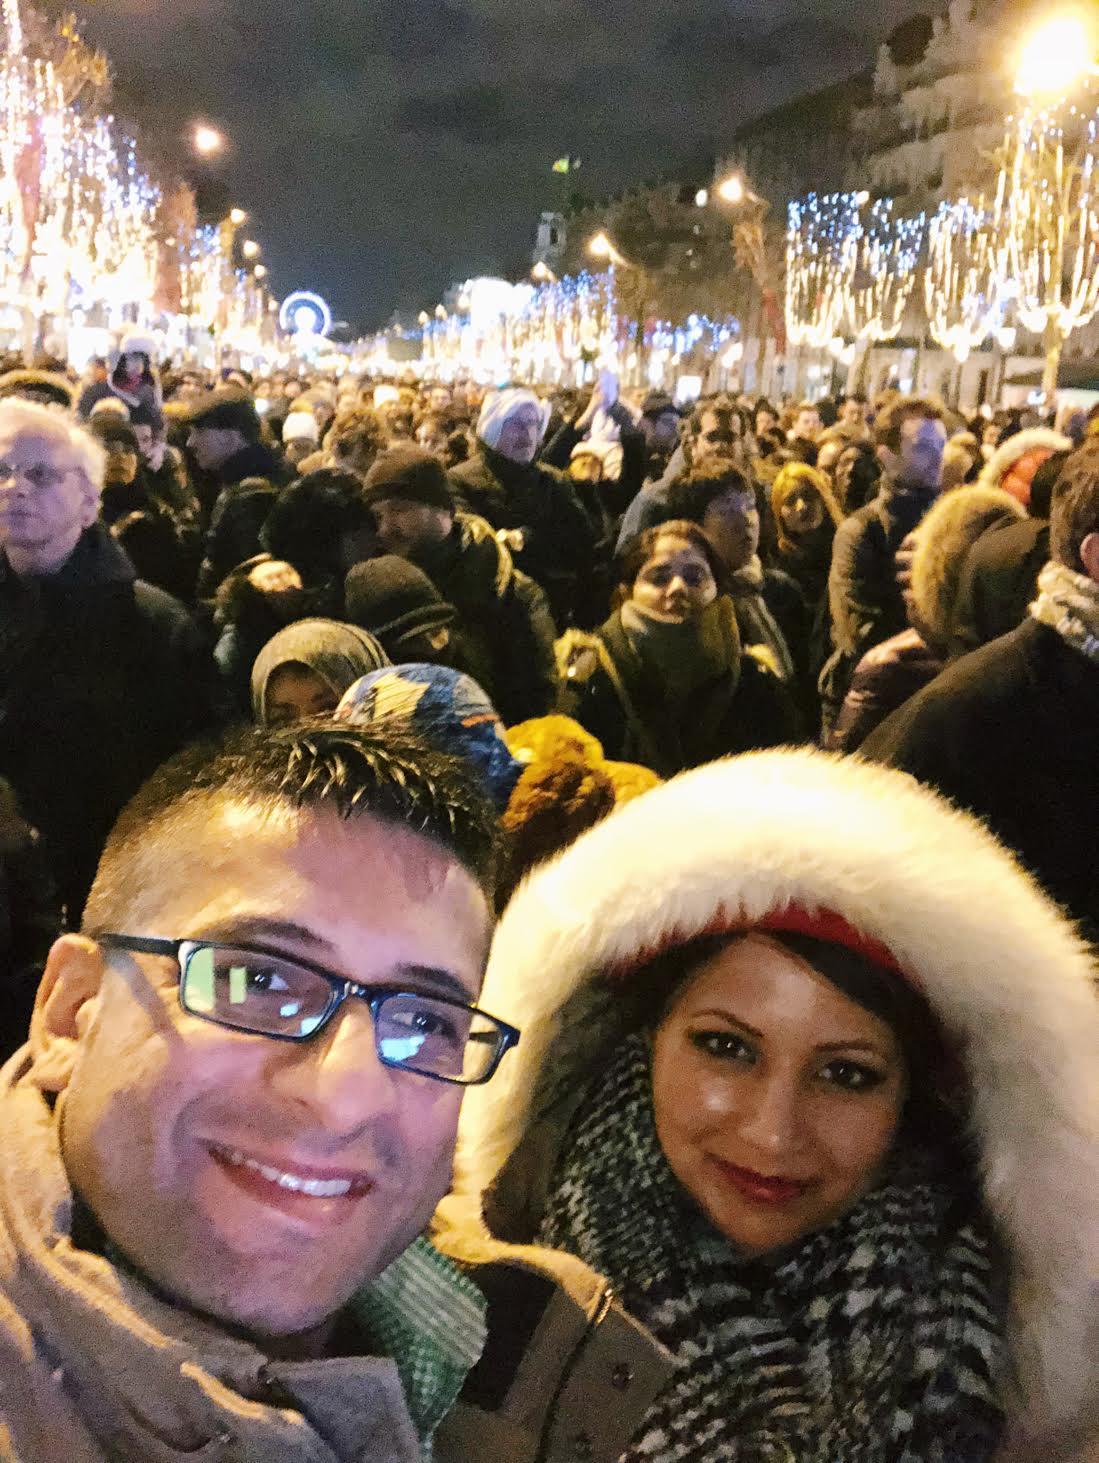 Muslim-travel-tips-New-Years-Eve-Champs-Elysees.jpg